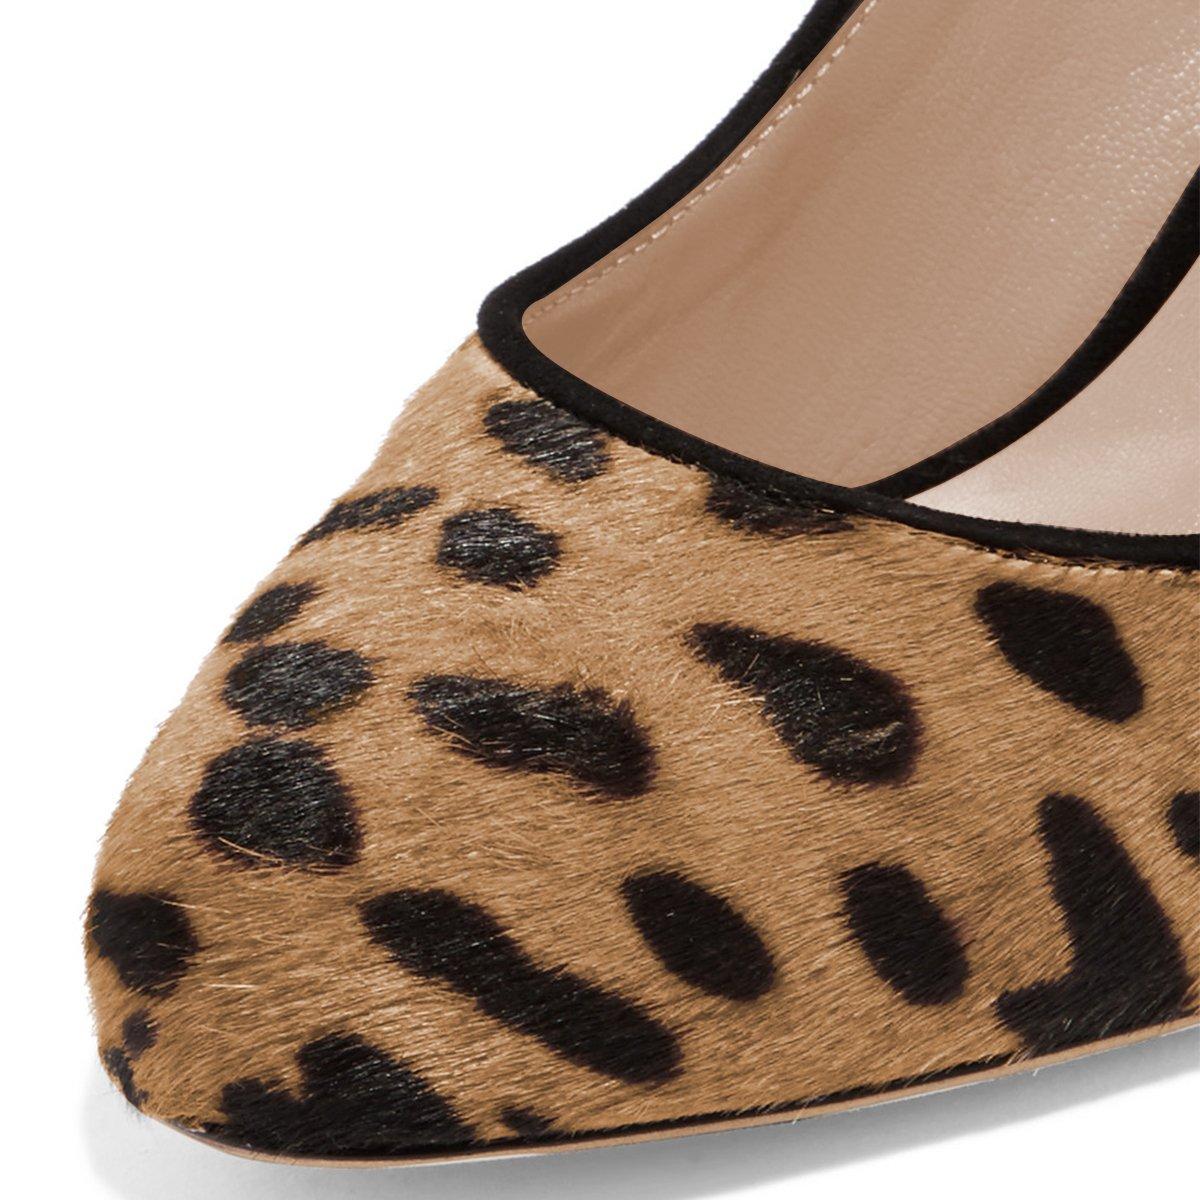 FSJ Women Classic Round Toe Velvet Pumps Chunky High Heels Slip On Office Dress Shoes Size 4-15 US B07B2YBT57 8.5 M US|Leopard-10 Cm